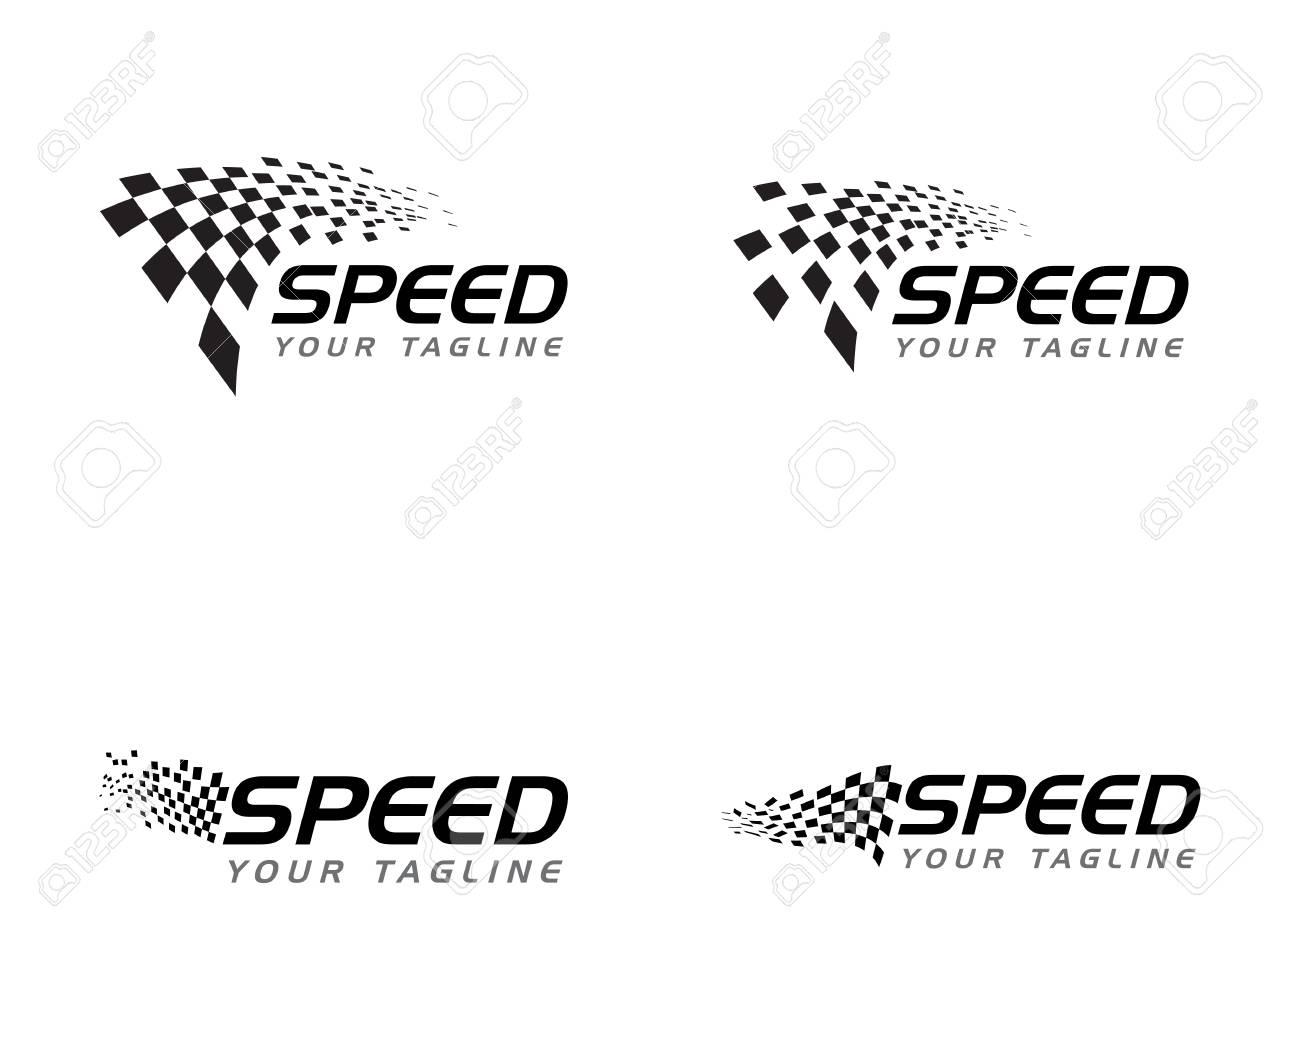 Race flag icon, simple design illustration vector - 115883353